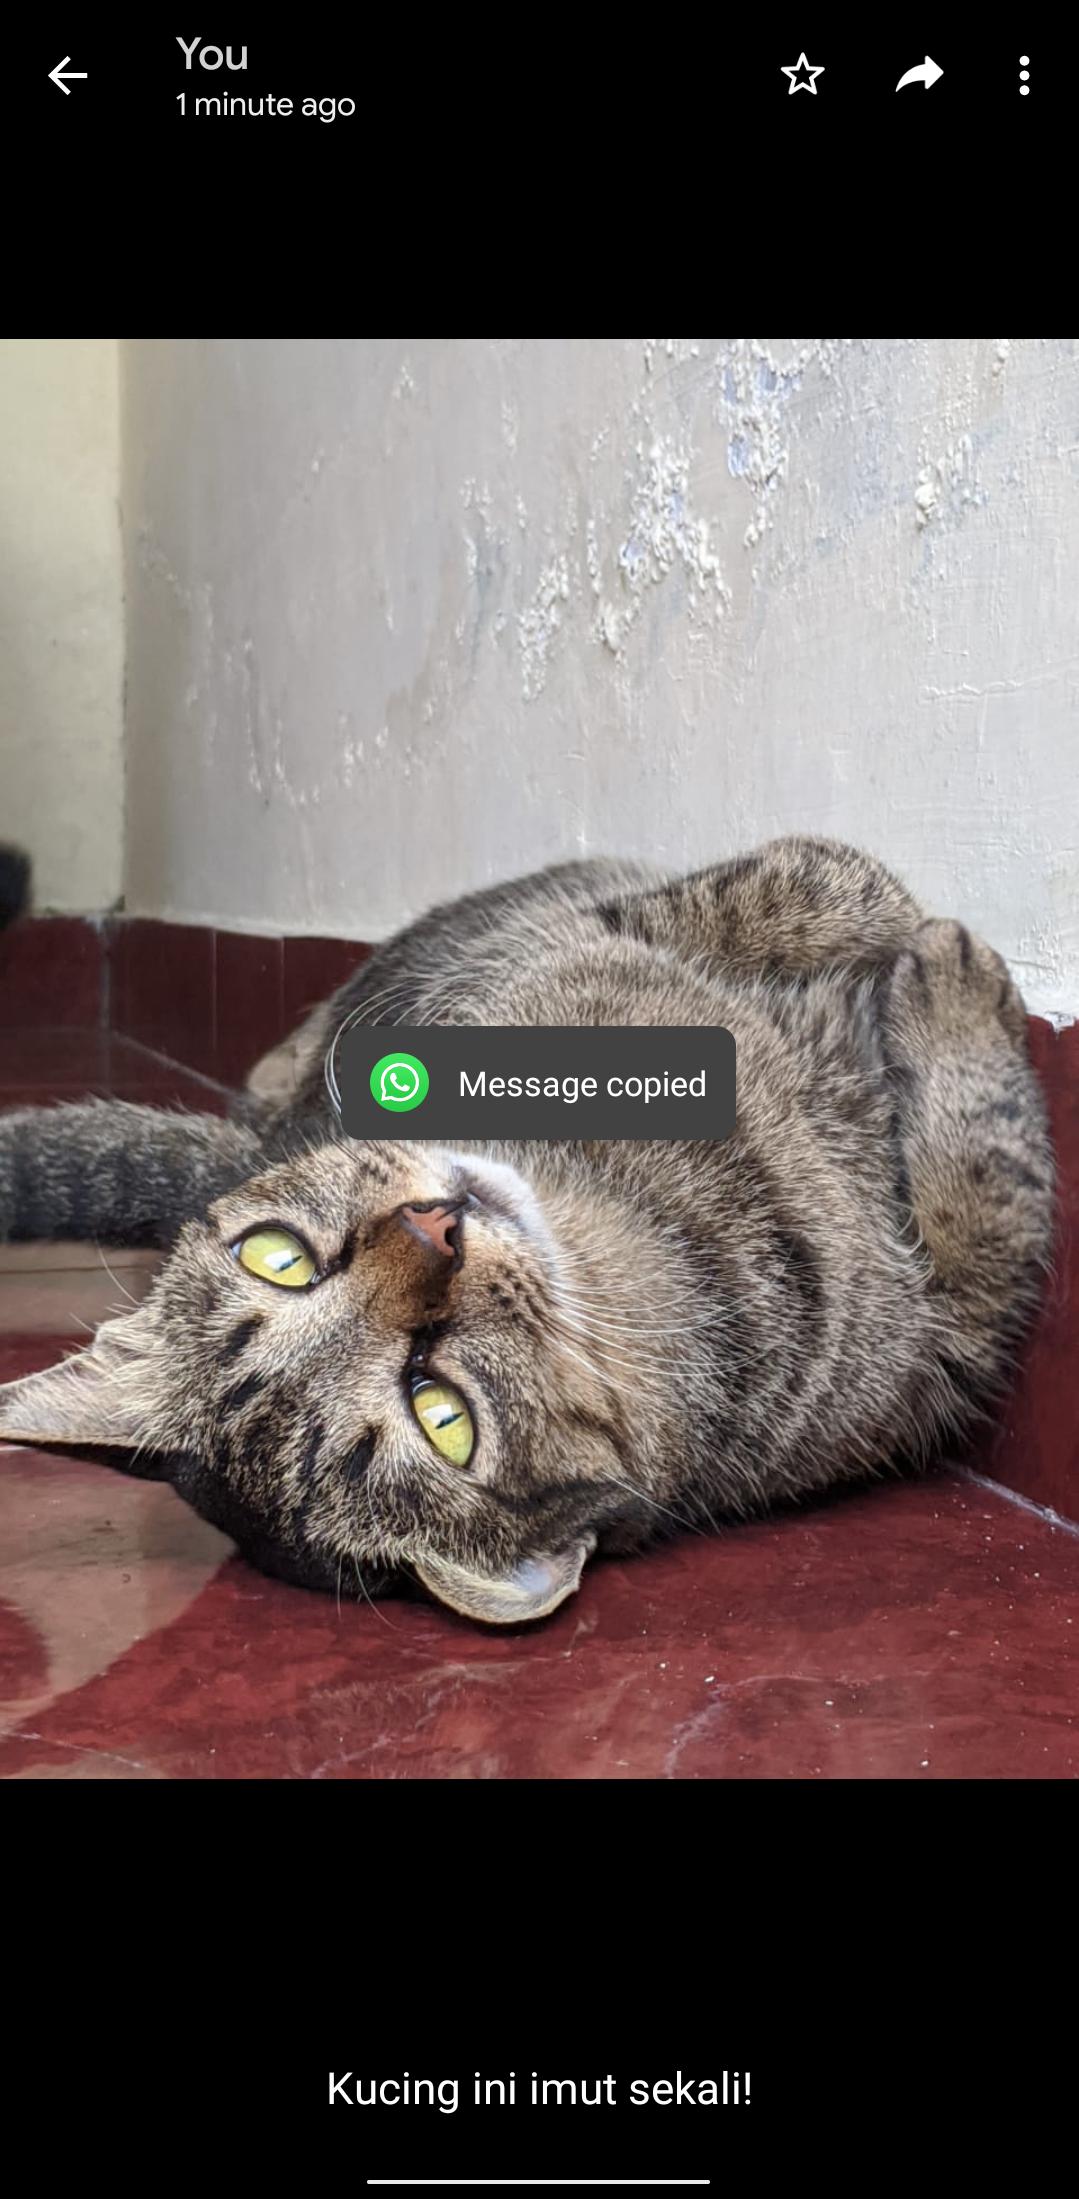 Lifehack Whatsapp - Copy Caption Teks Yang Dikirim Bersama Gambar Oleh Temanmu di Whatsapp